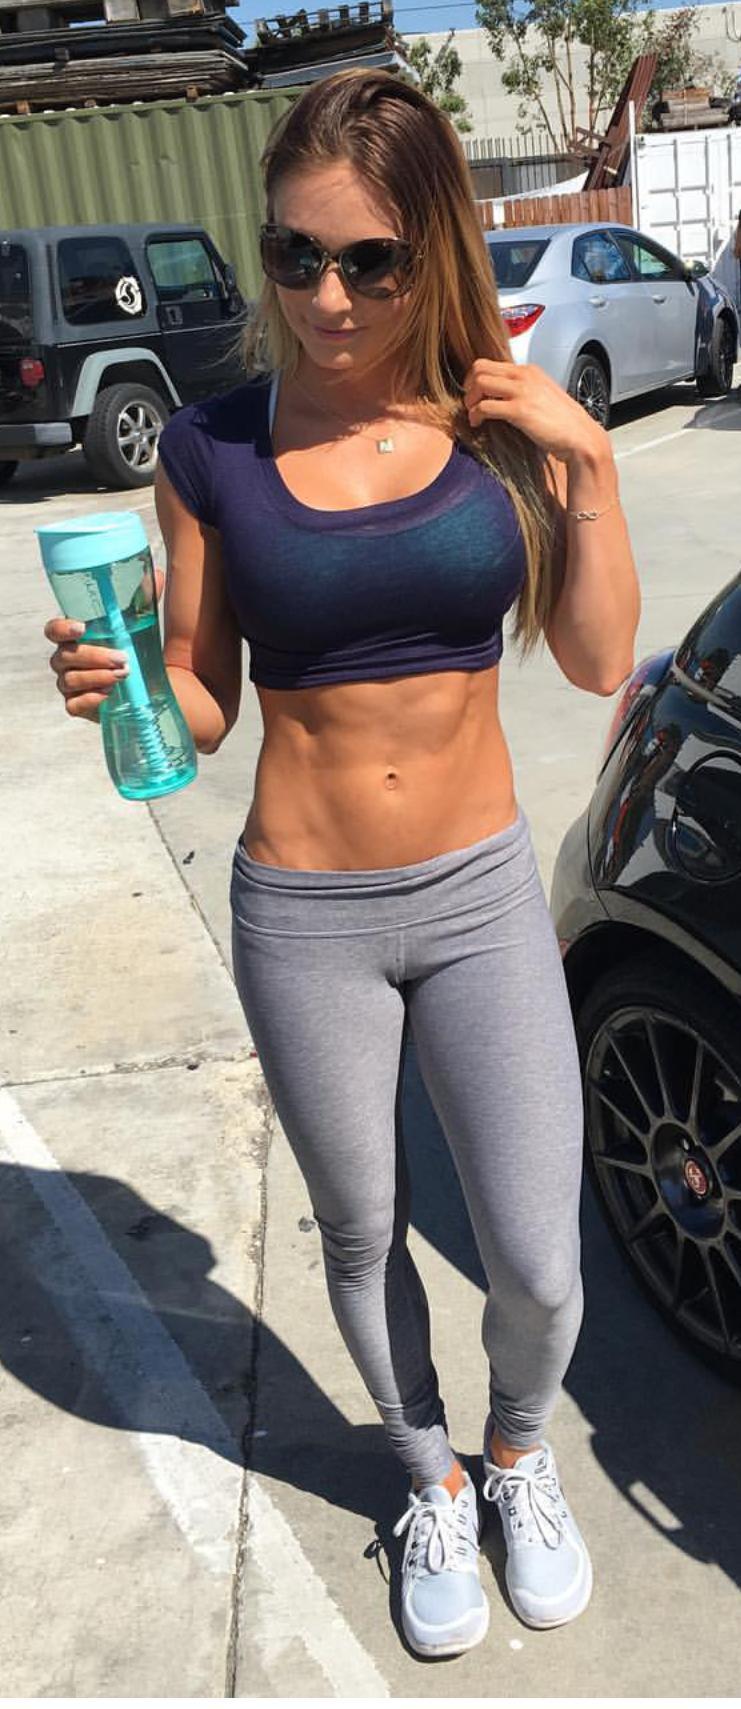 Can anyone ID her?